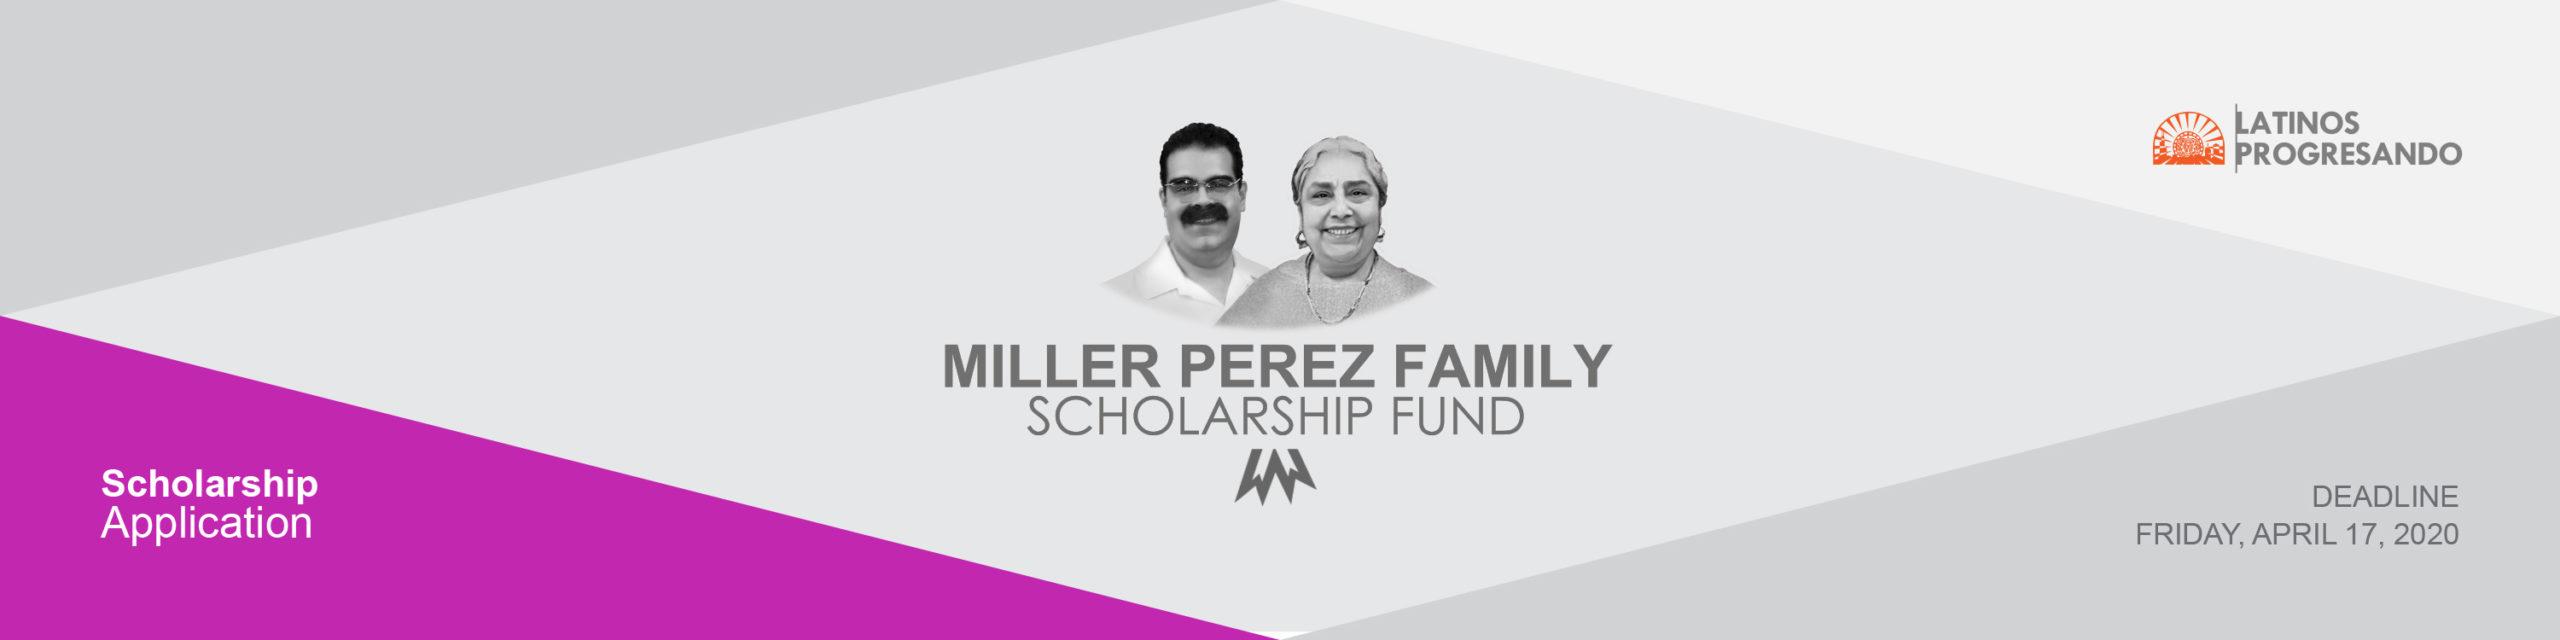 Miller Perez Family Scholarship Fund